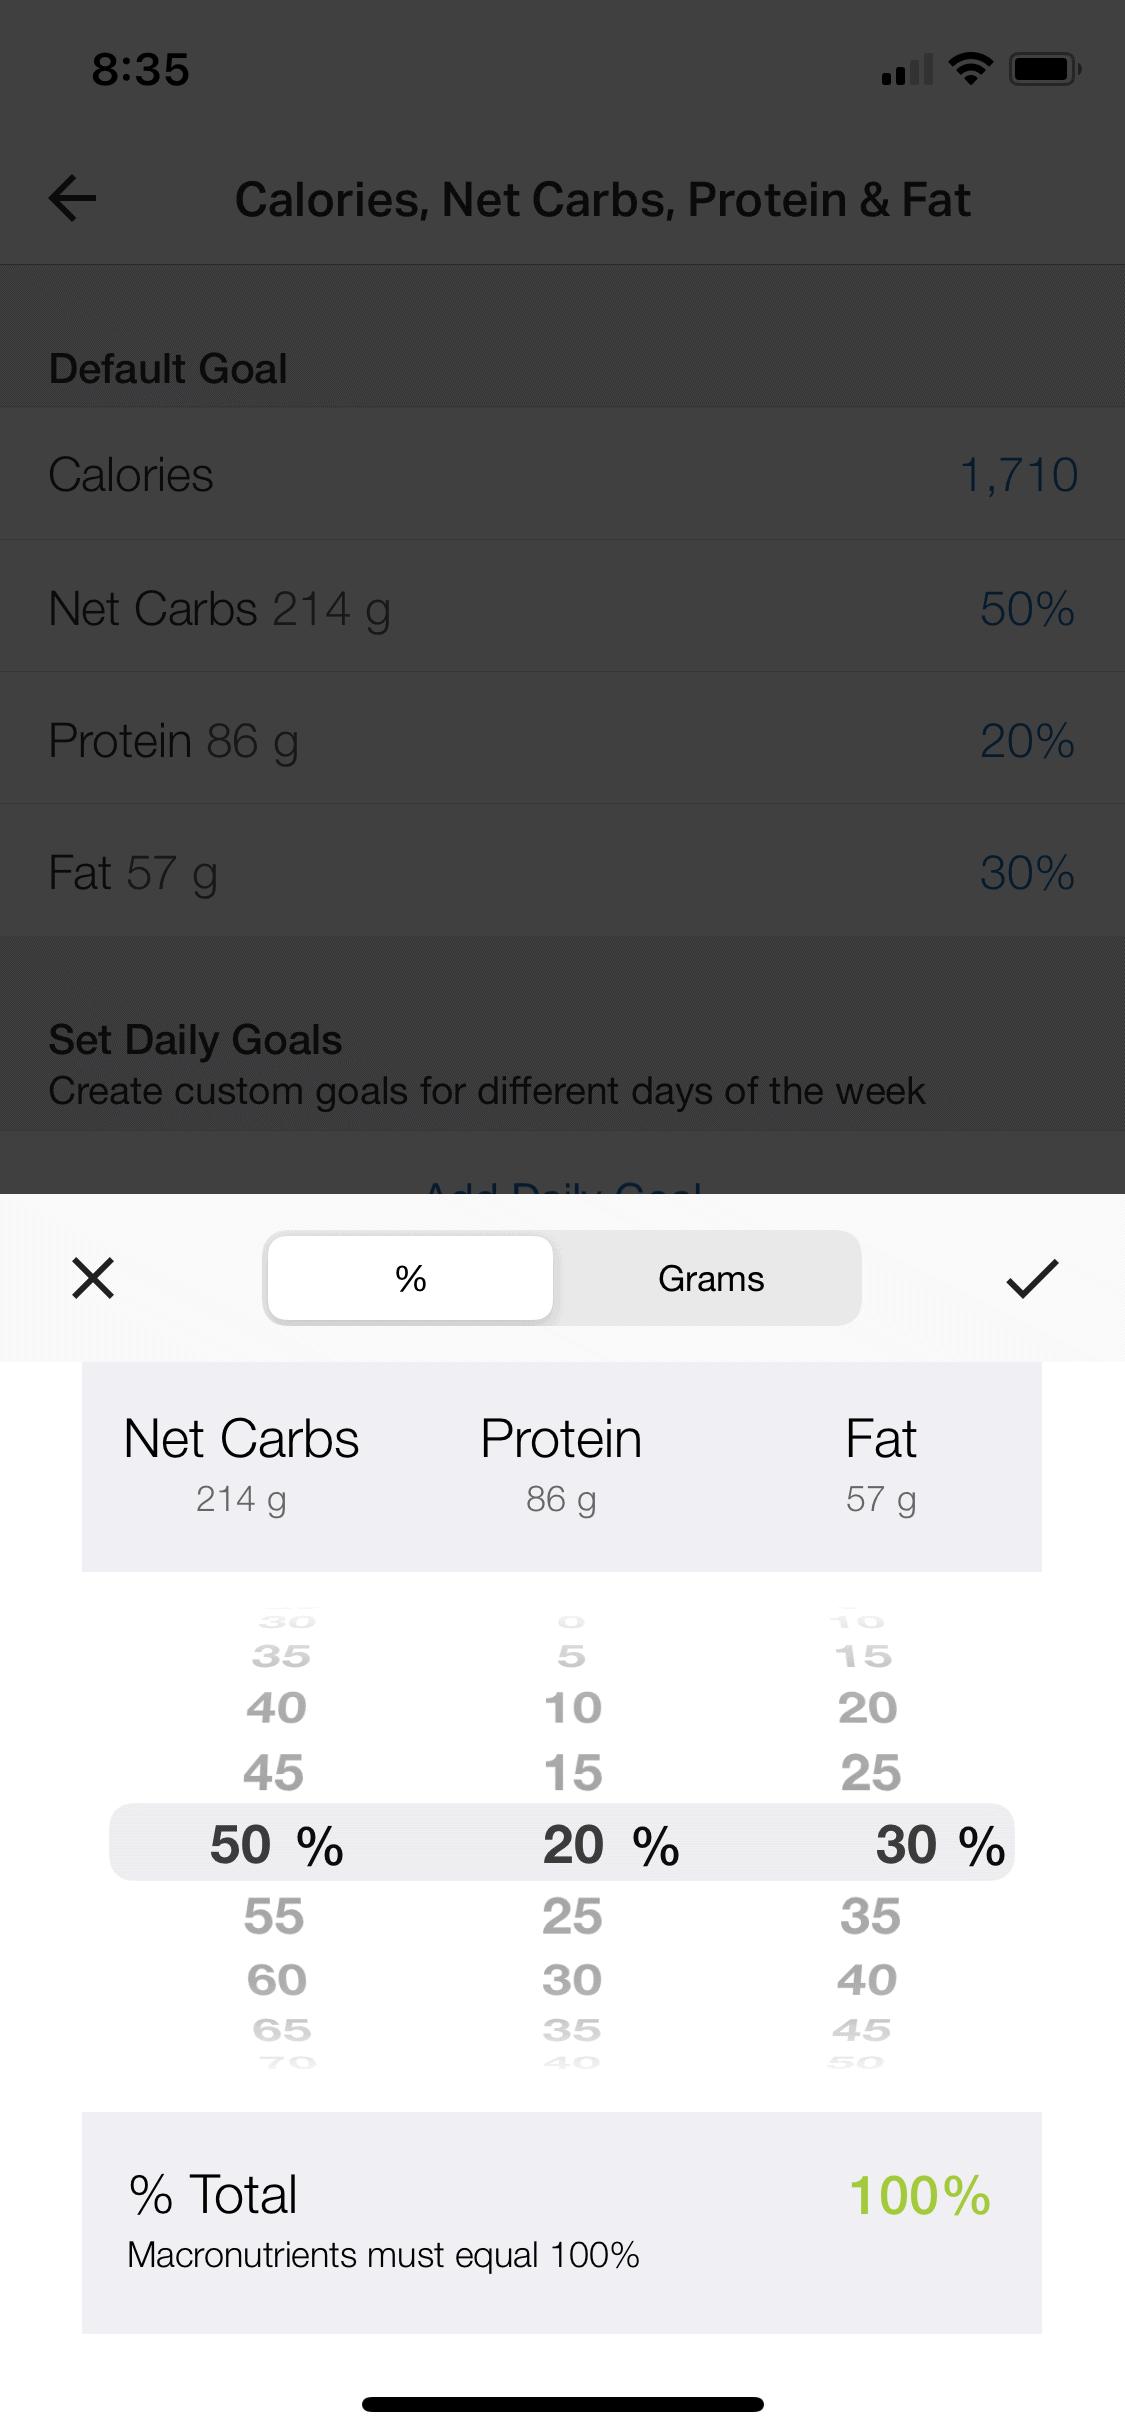 Setting macro goals in MyFitnessPal